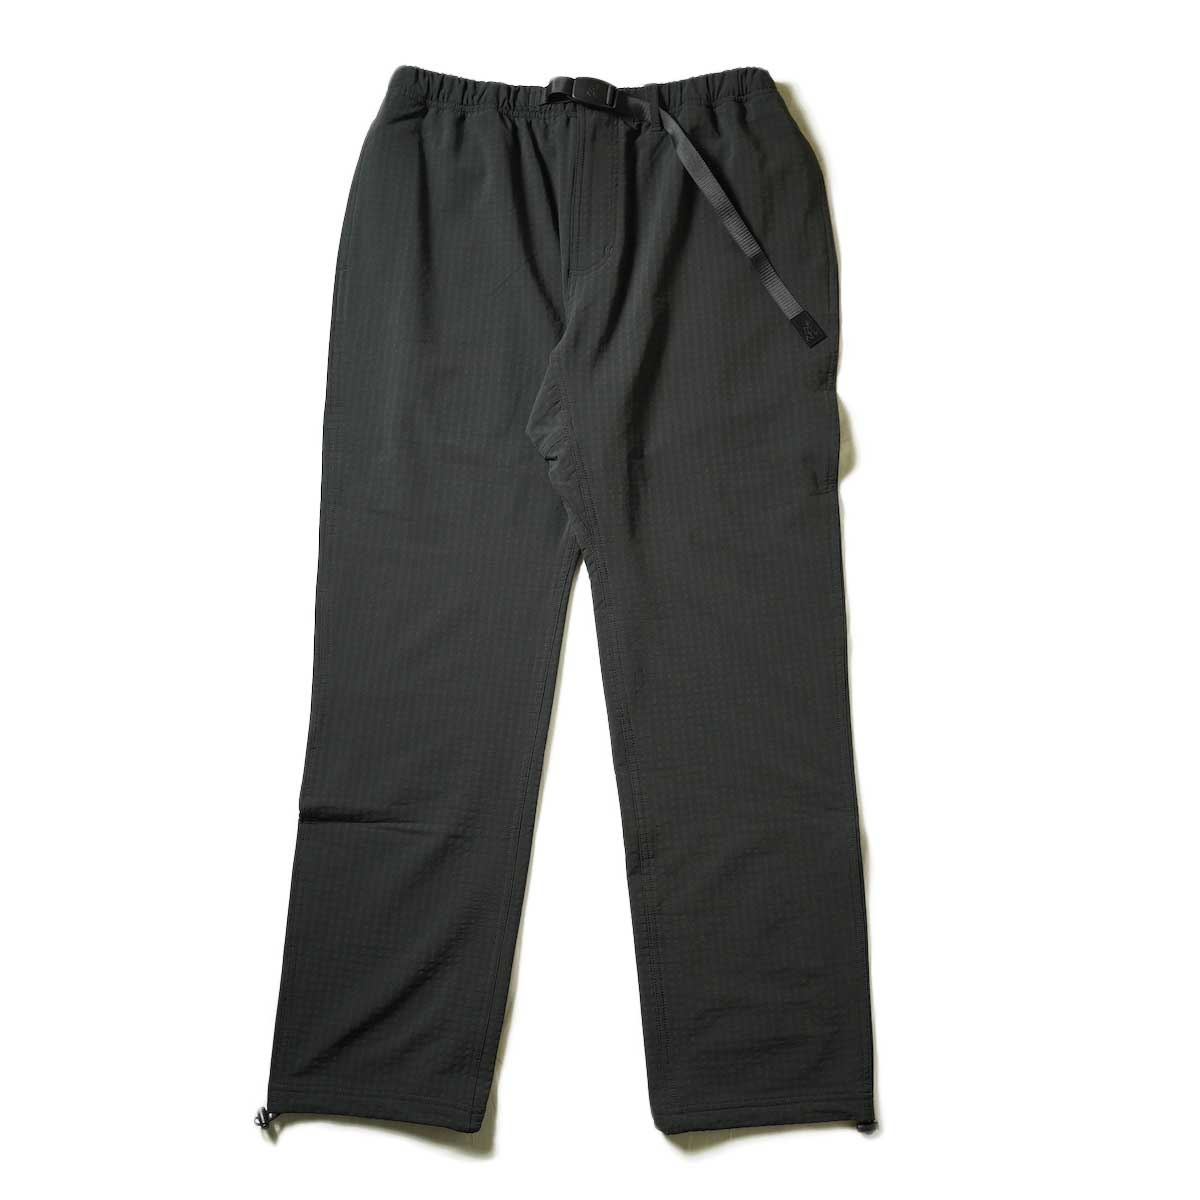 GRAMICCI / STORMFLEECE WHITNEY PANTS (Black)